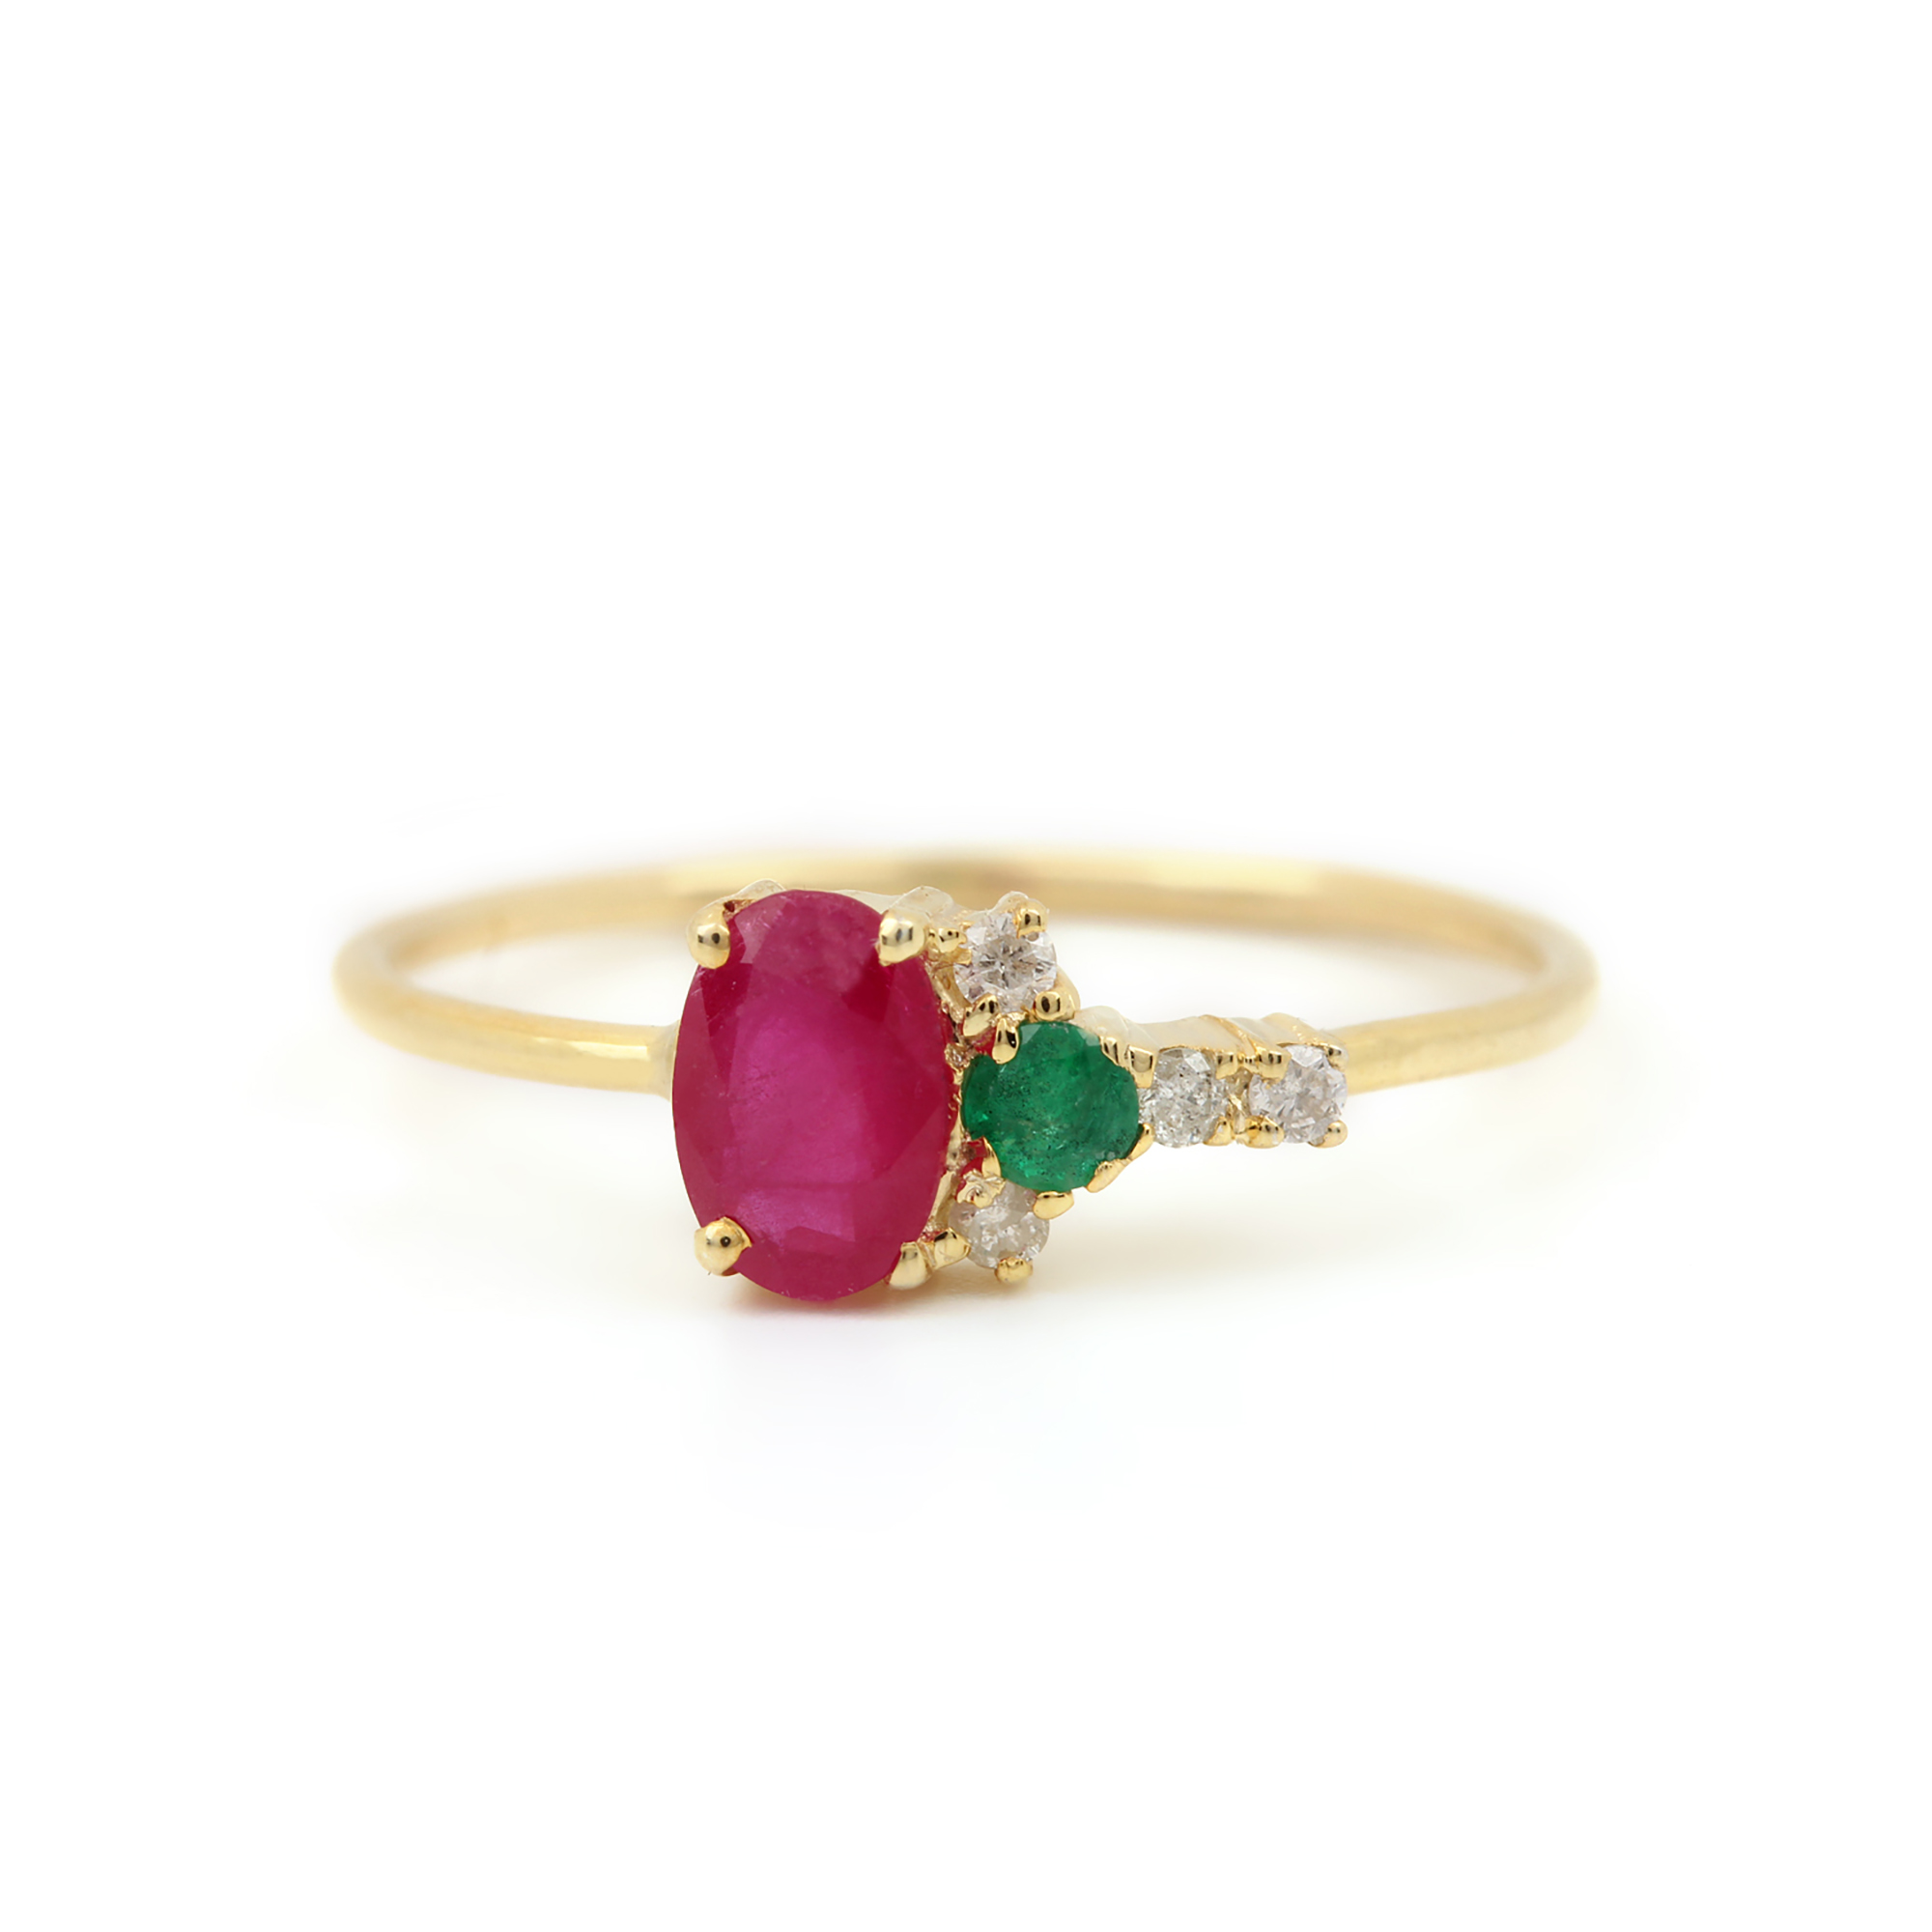 14k Solid Gold Diamond Ruby & Emerald Ring Fine Jewelry